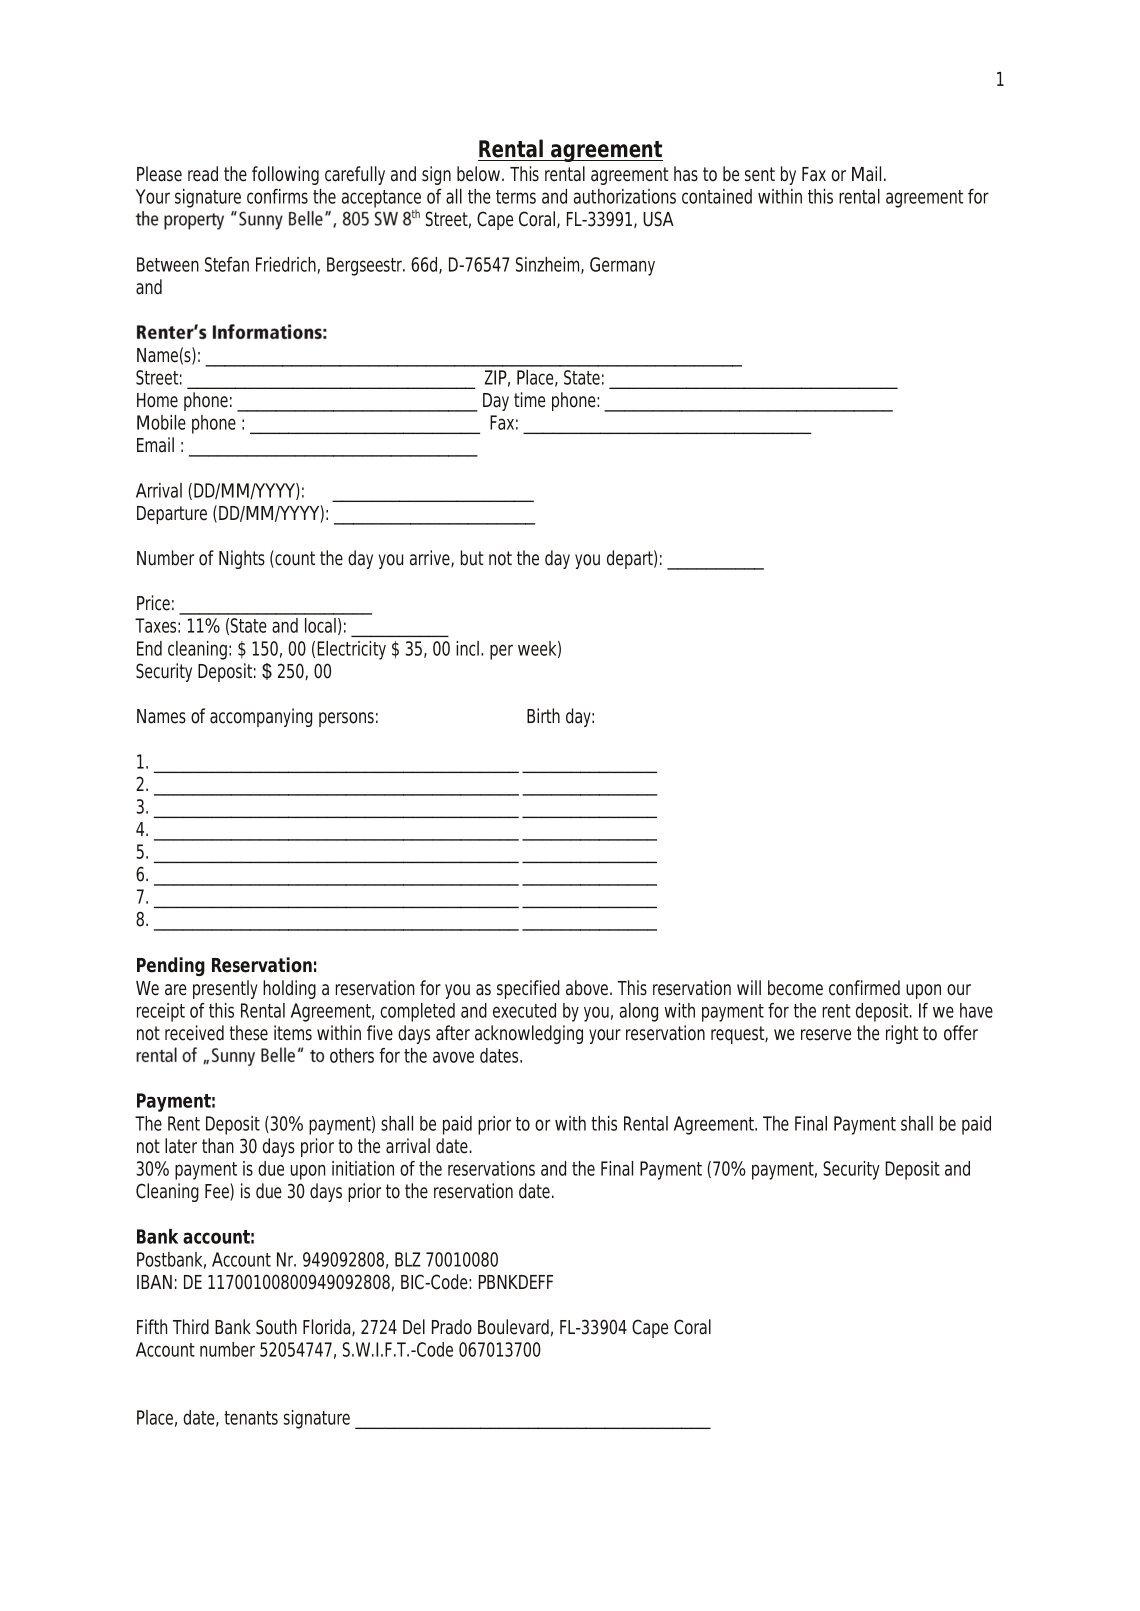 Perfect Mieter Receipt Mold - FORTSETZUNG ARBEITSBLATT - tsuhaan.info